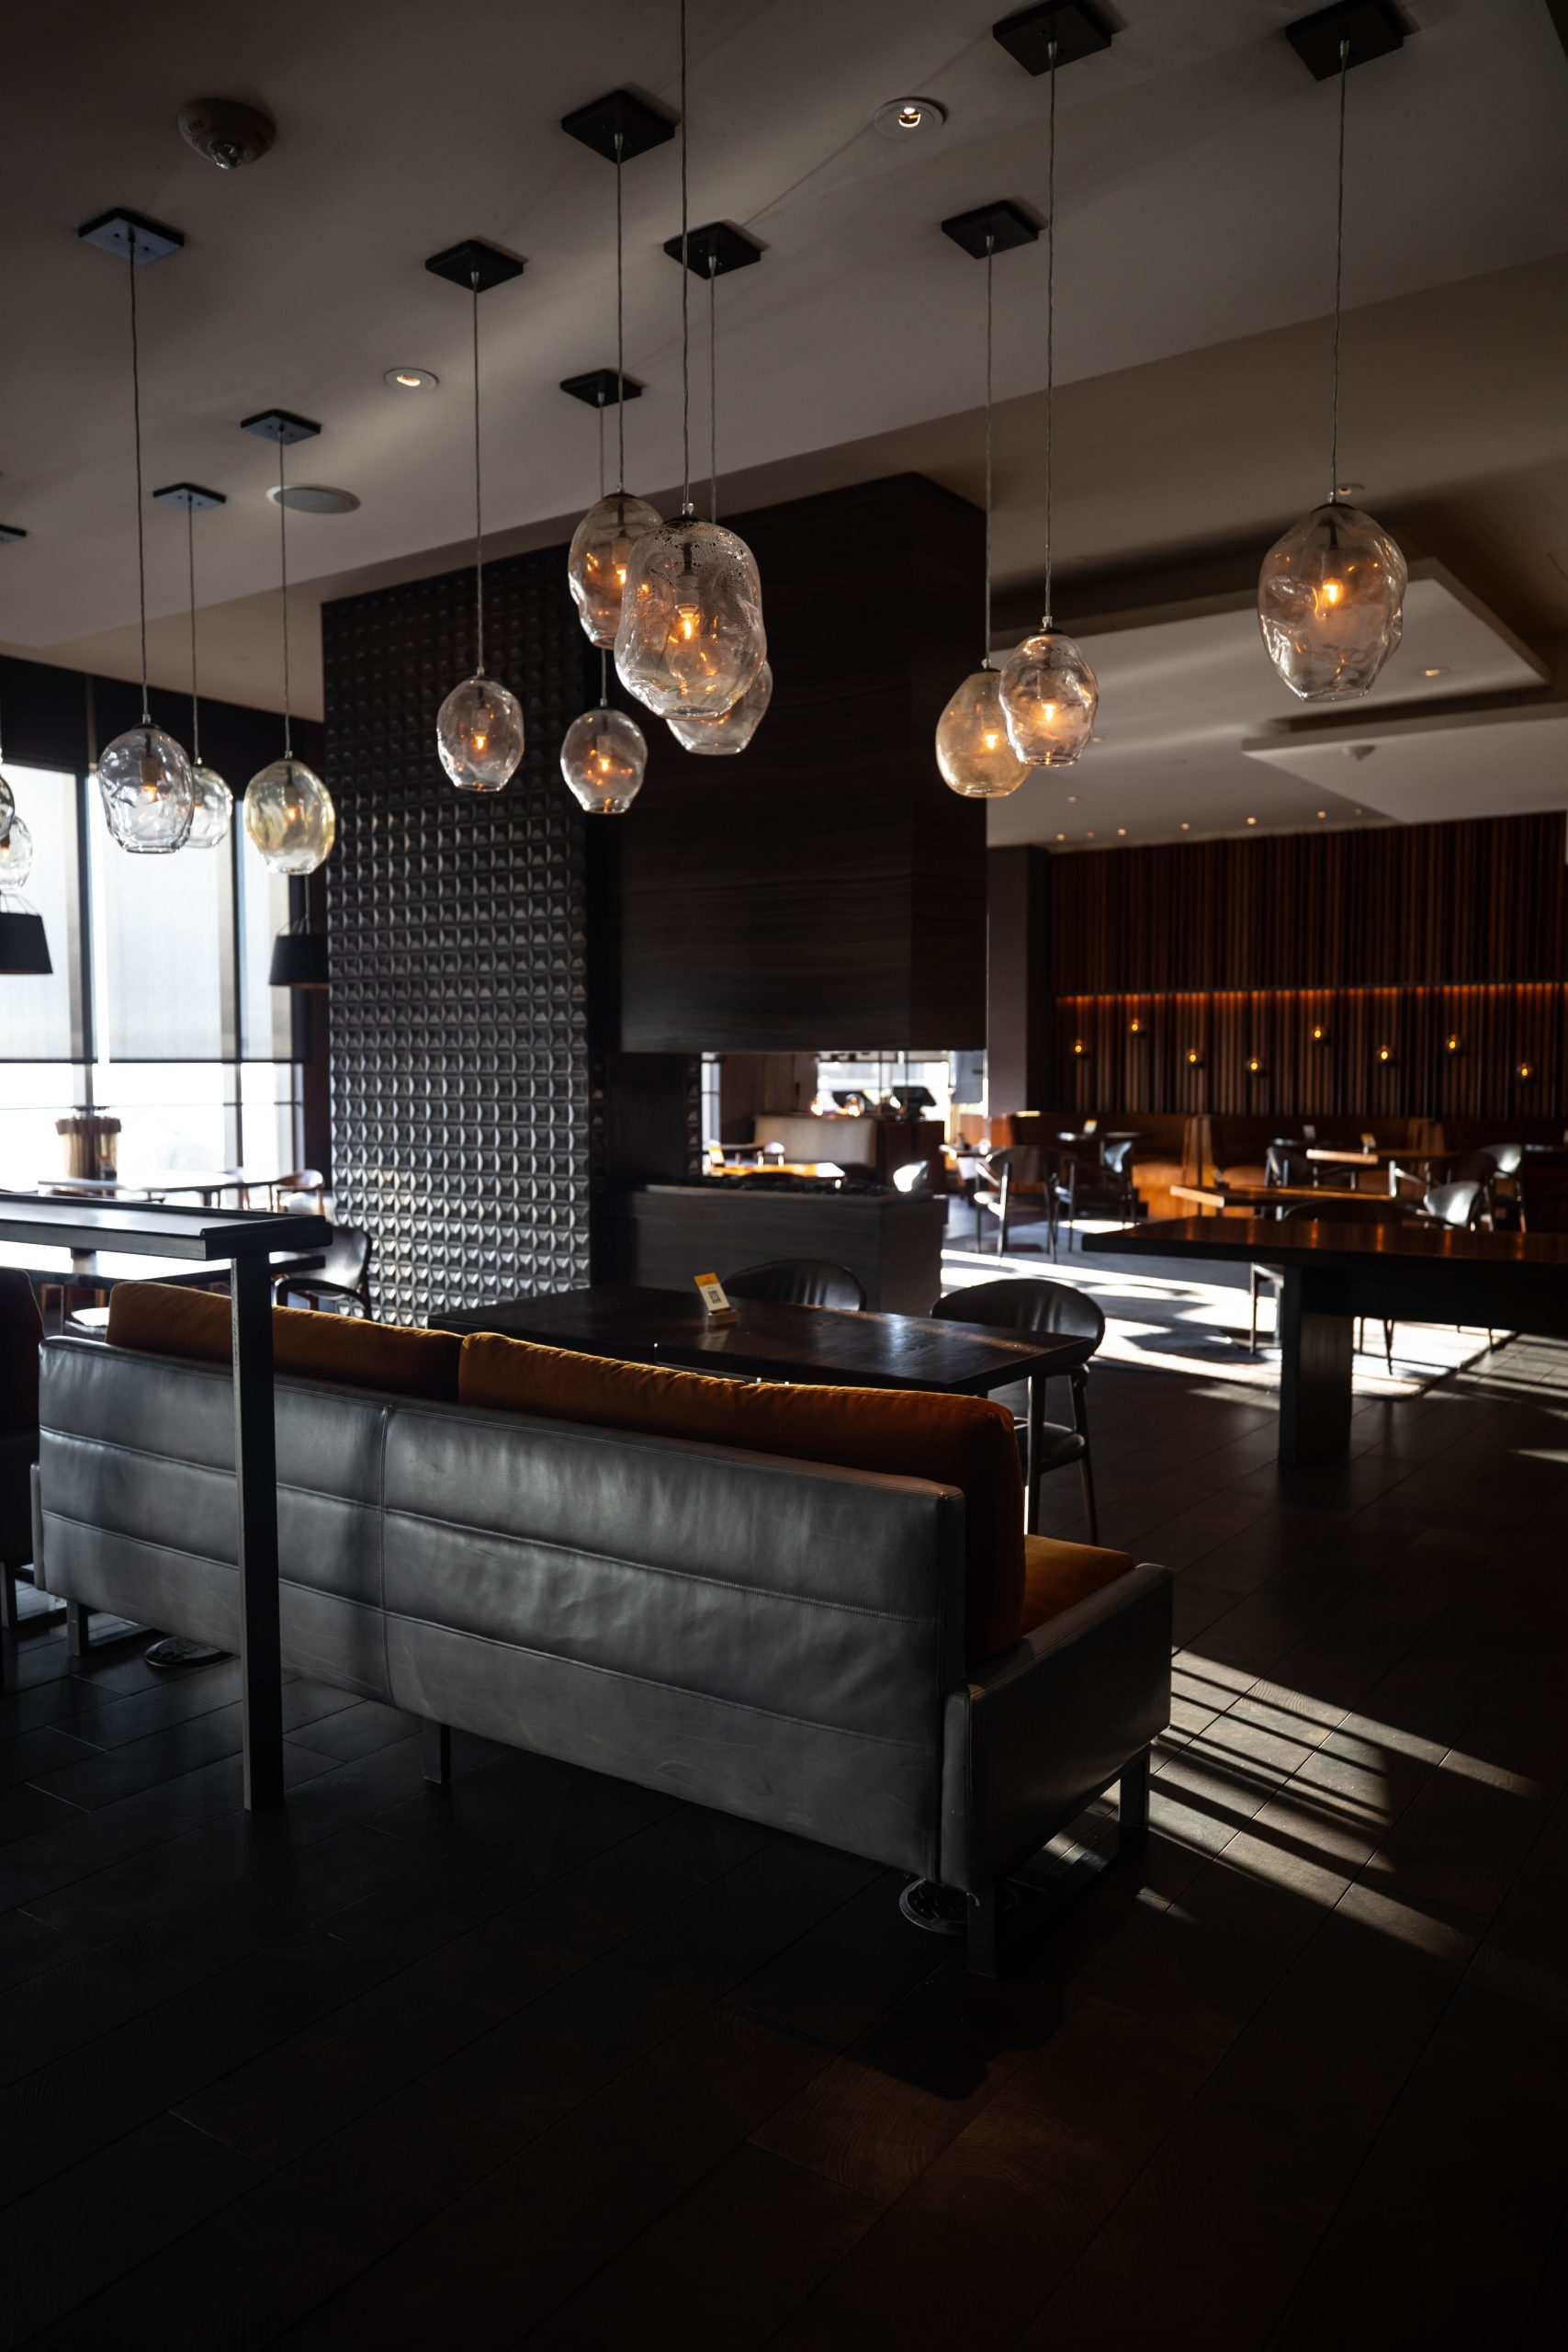 Goldfinch Tavern Four Seasons Hotel Seattle Washington by Annie Fairfax for AnnieFairfax.com Luxury Hotels of the World Pacific Northwest Luxury 5-Star Hotels